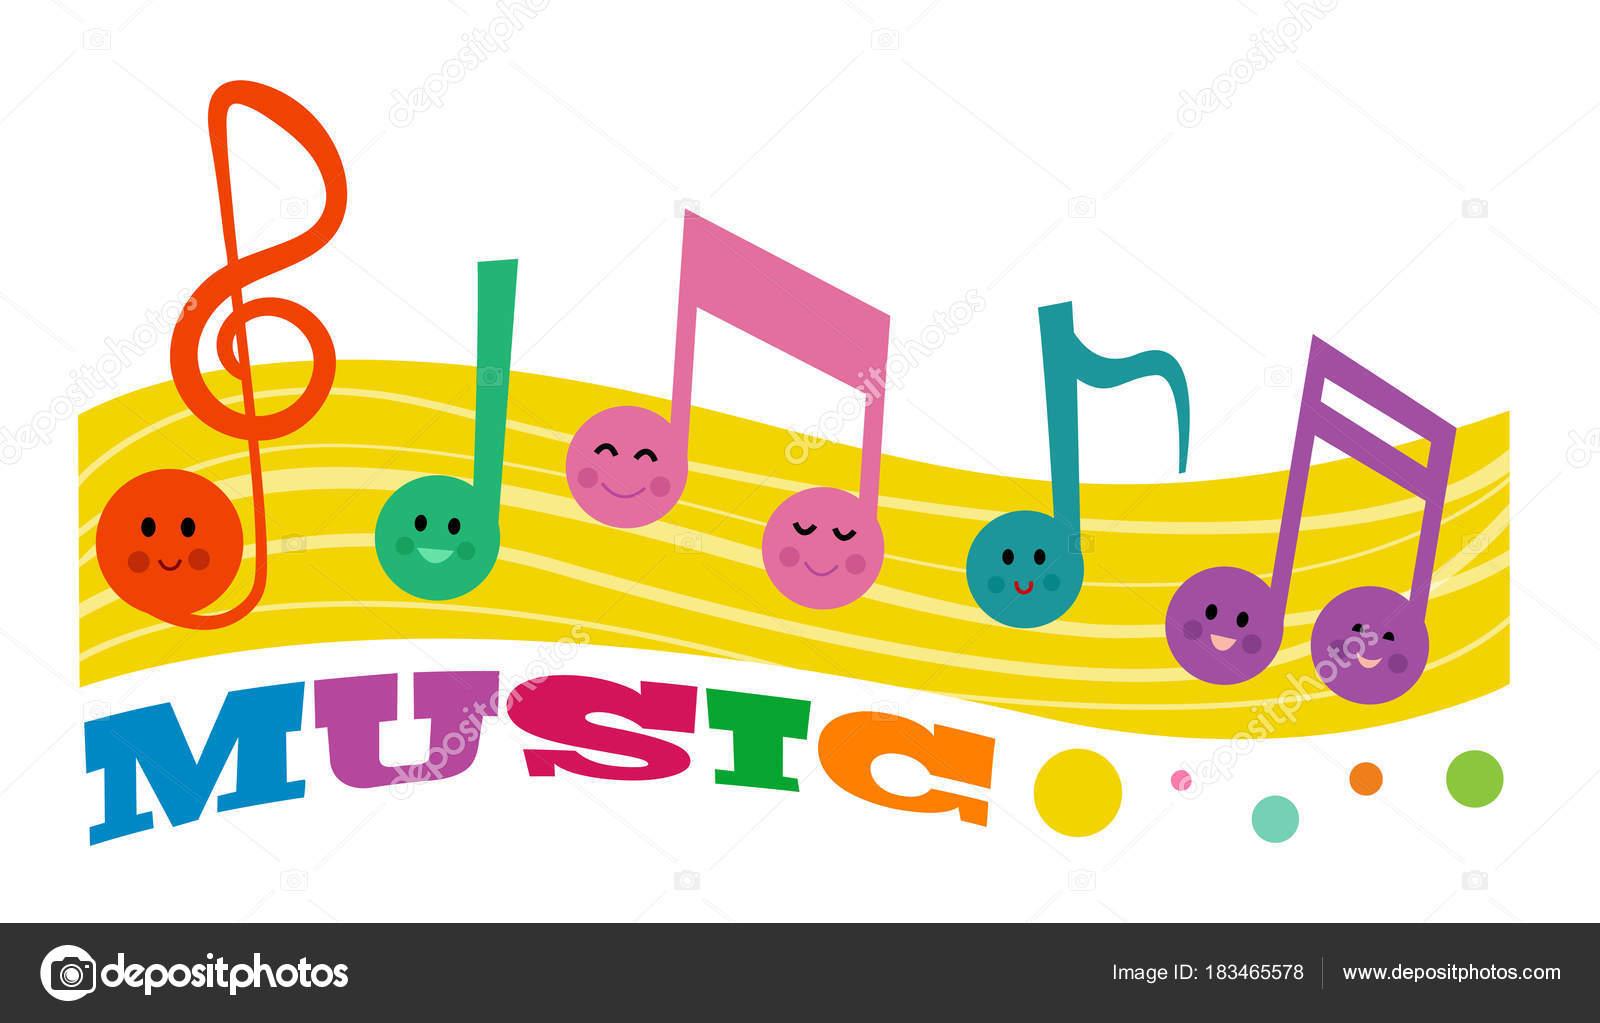 Cictures Clip Art Music Notes Music Notes Colorful Clip Art Smiling Music Notes Word Music Stock Vector C Bilhagolan 183465578